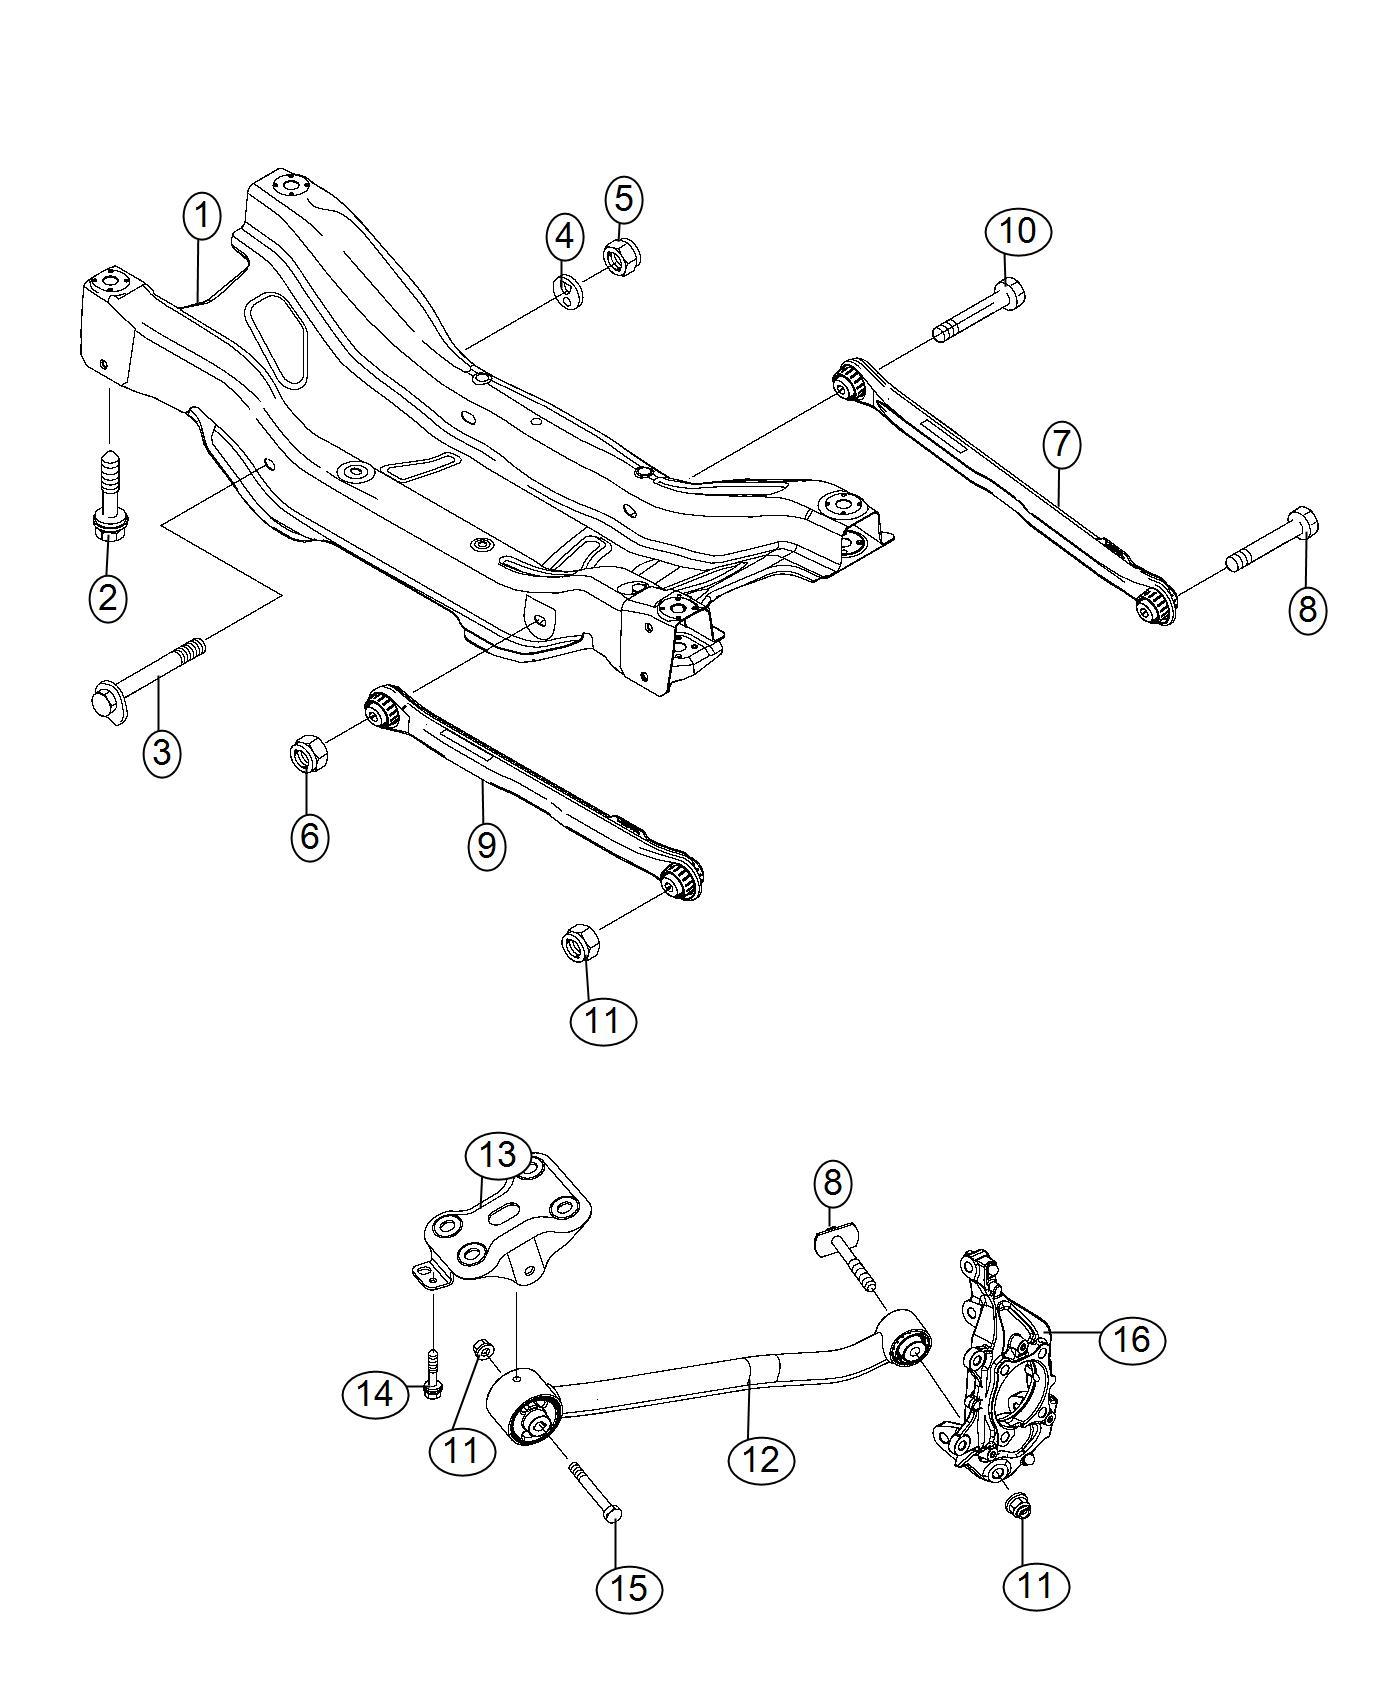 2017 Jeep Renegade Guide rod. Suspension. Rear